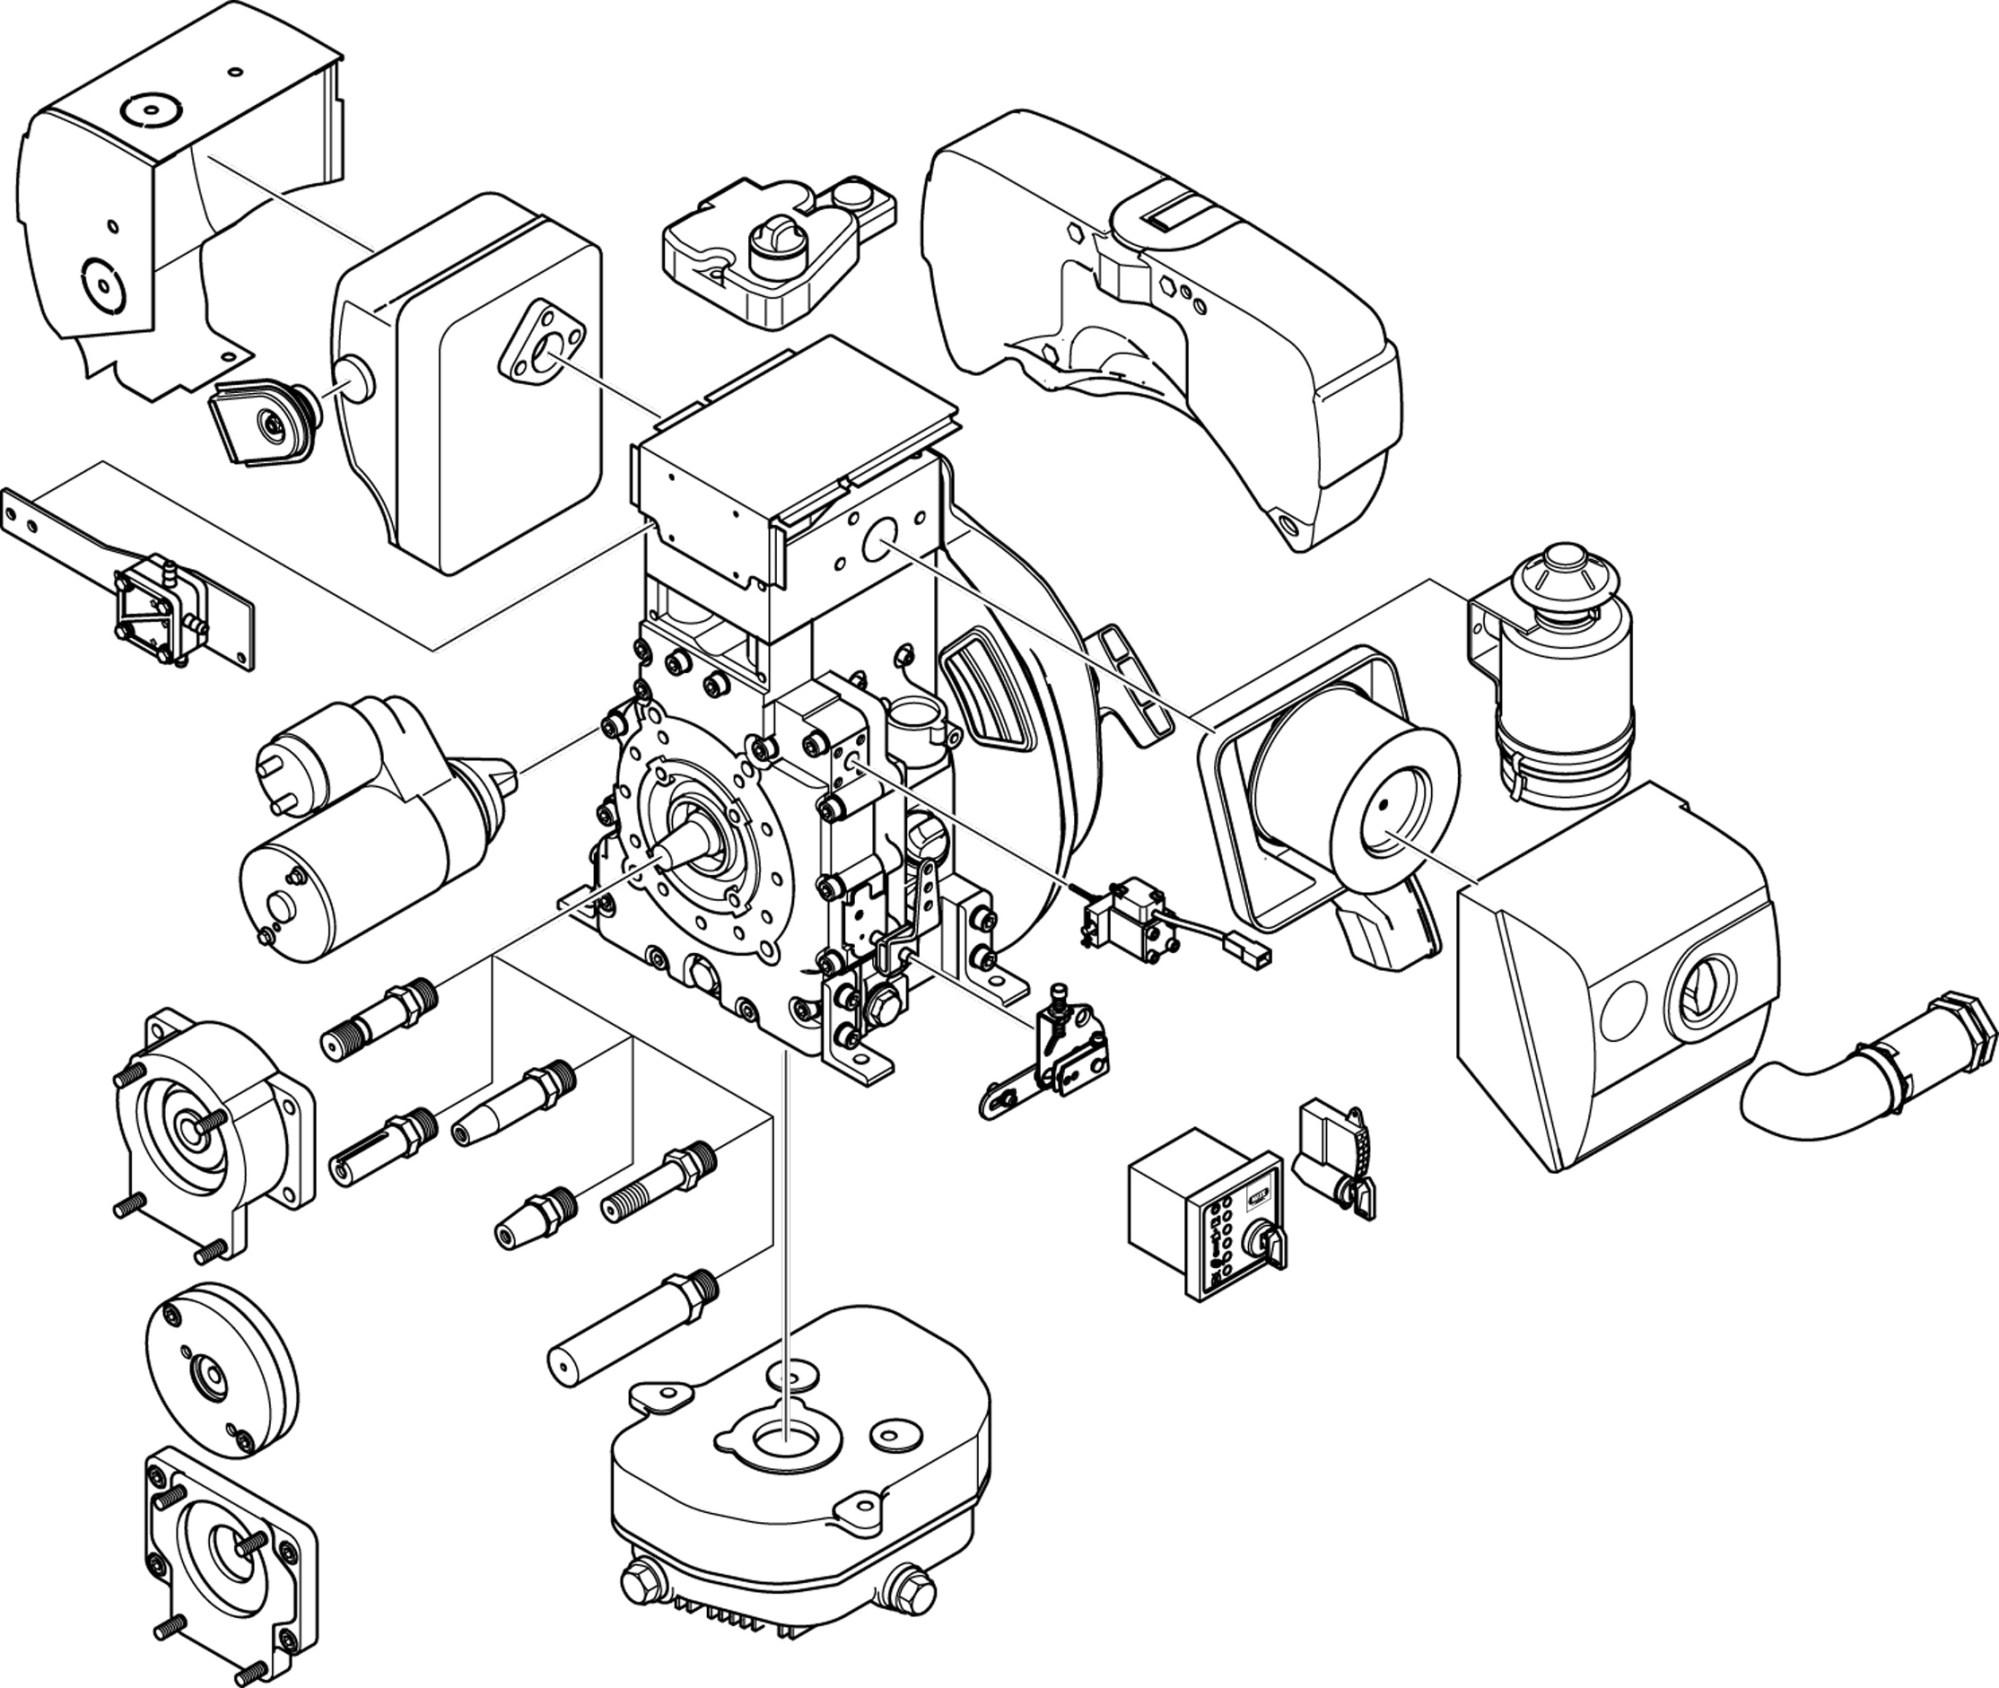 hight resolution of hatz sel wiring diagrams yanmar engine wiring diagram hatz engine 4l41c hatz engine 2m41z